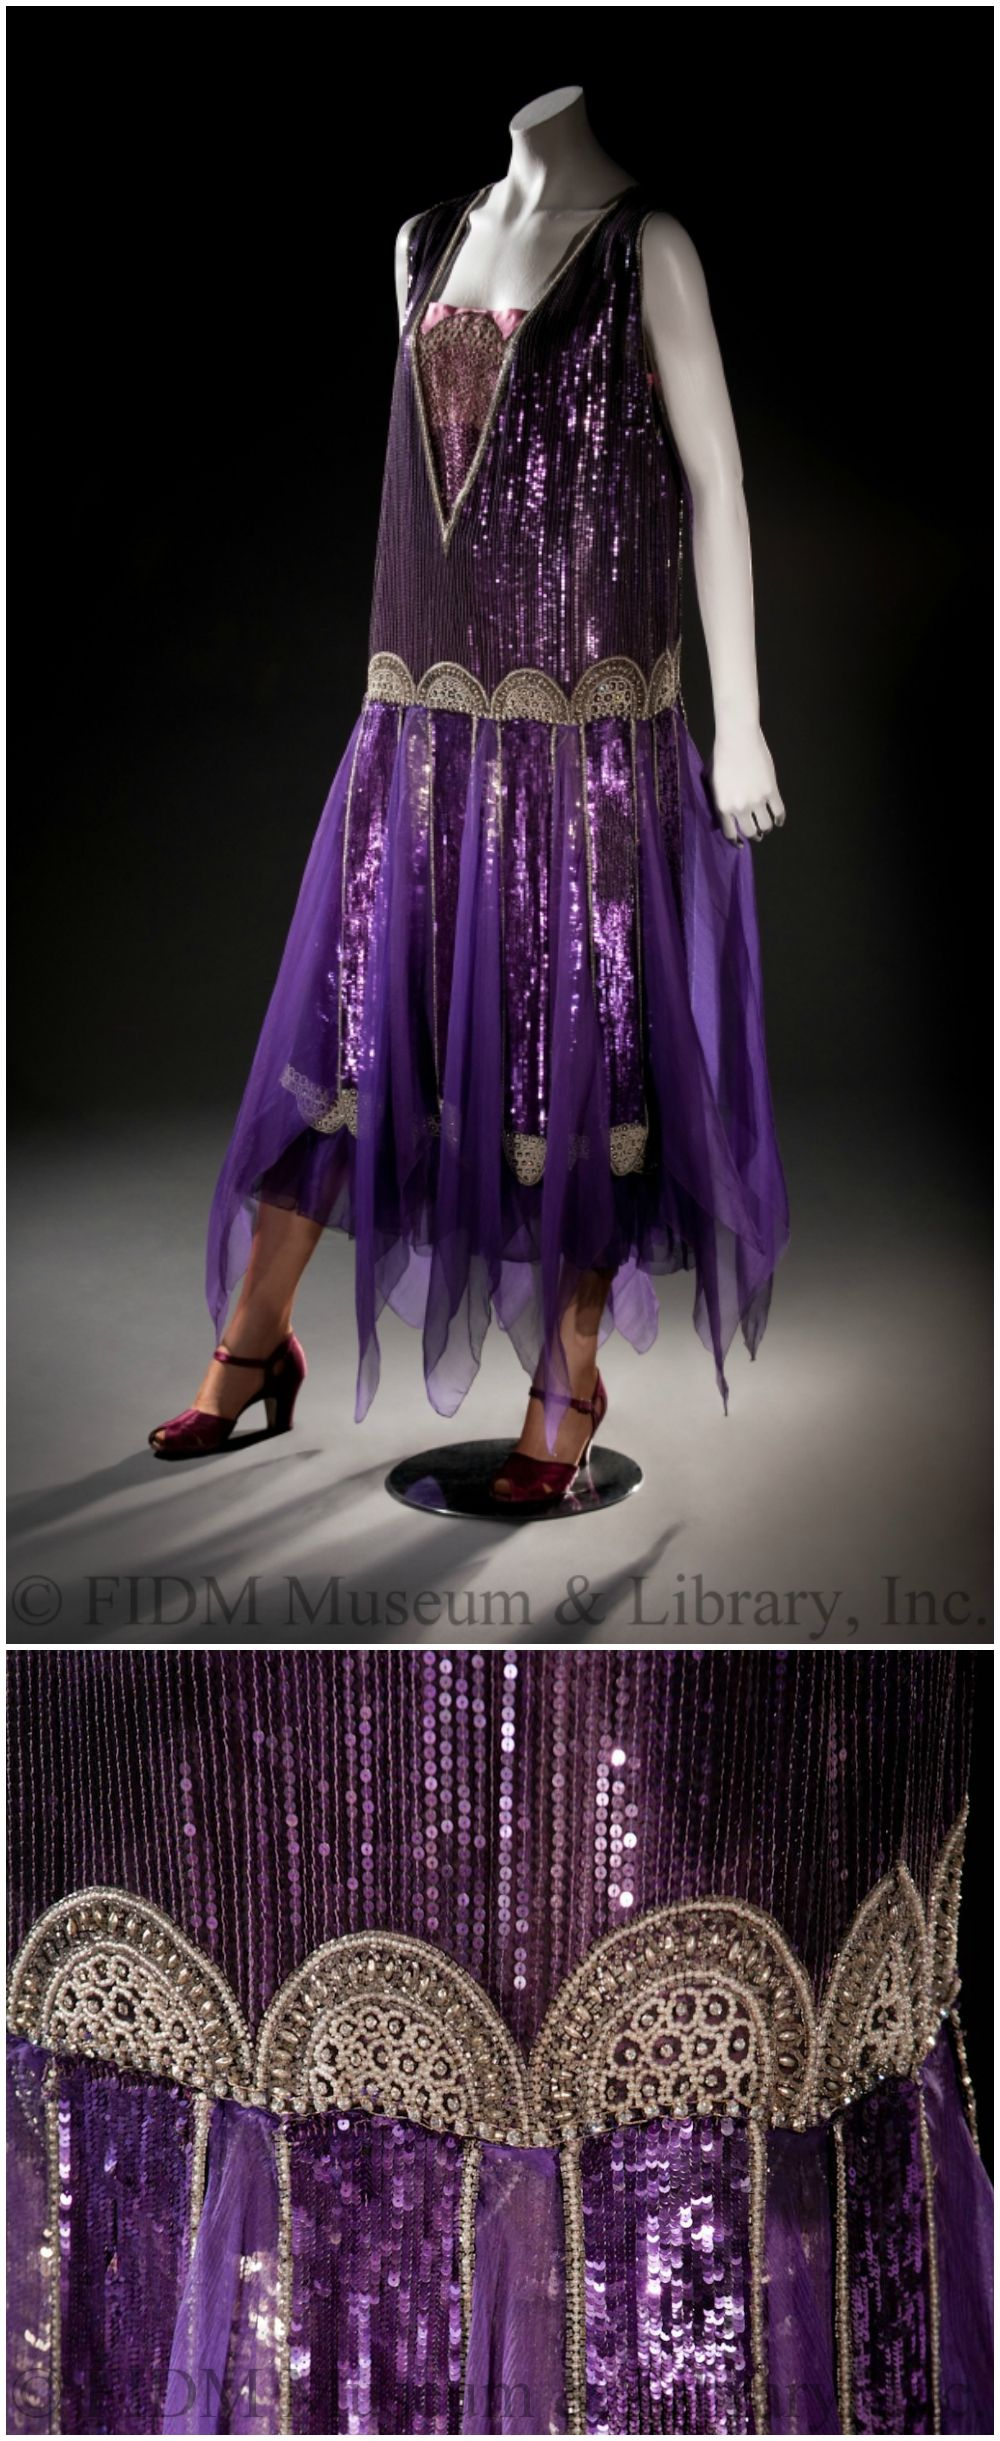 Purple chiffon dress, embellished with sequins, pearls, and diamante. Paul Poiret, Paris, France. 1928. Helen Larson Historic Fashion Collection. Via FIDM Museum Blog.